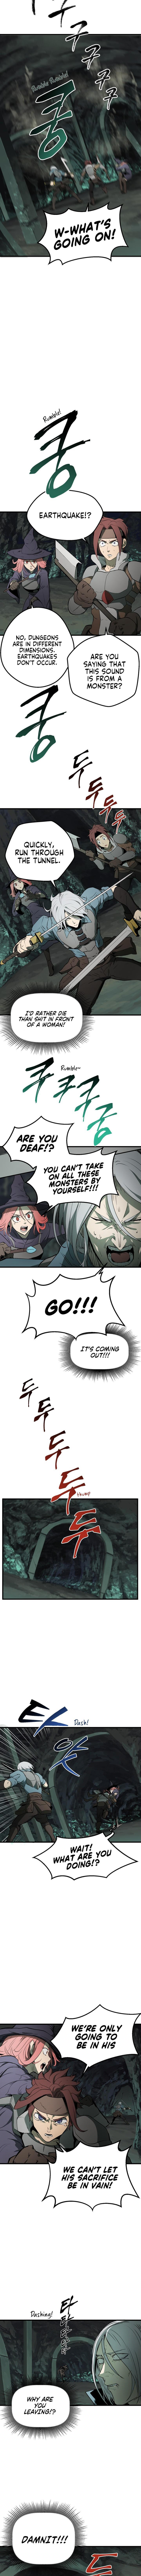 Survival Story Of A Sword King In A Fantasy World Vol.1 Chapter 8 page 8 - Mangakakalots.com